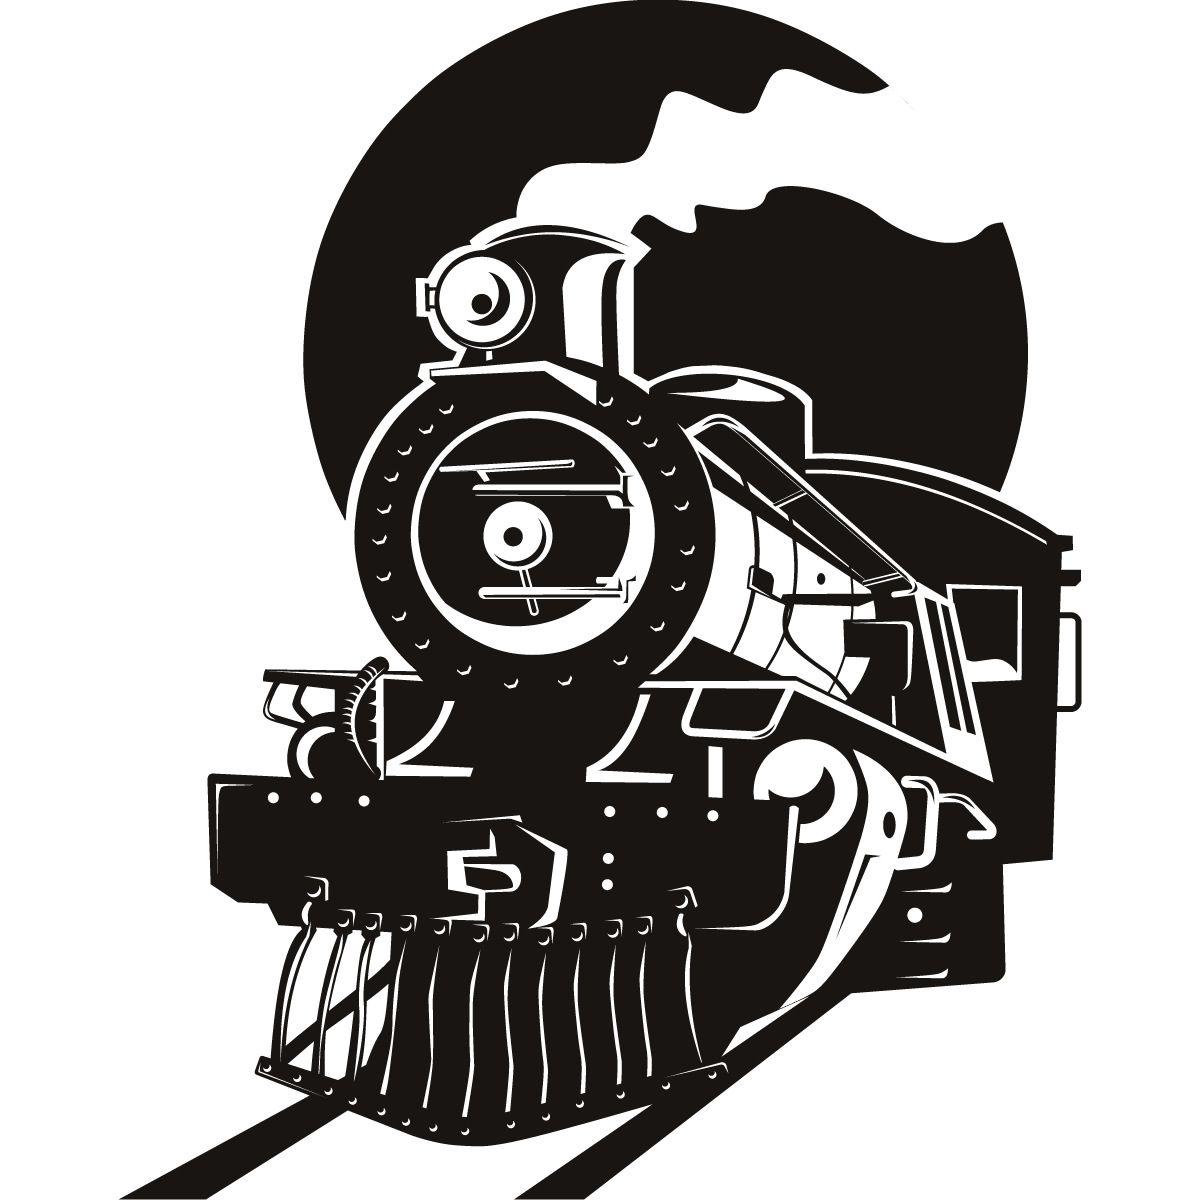 Train logos clipart banner royalty free download Steam Locomotive Silhouette Steam locomotive silhouette ... banner royalty free download